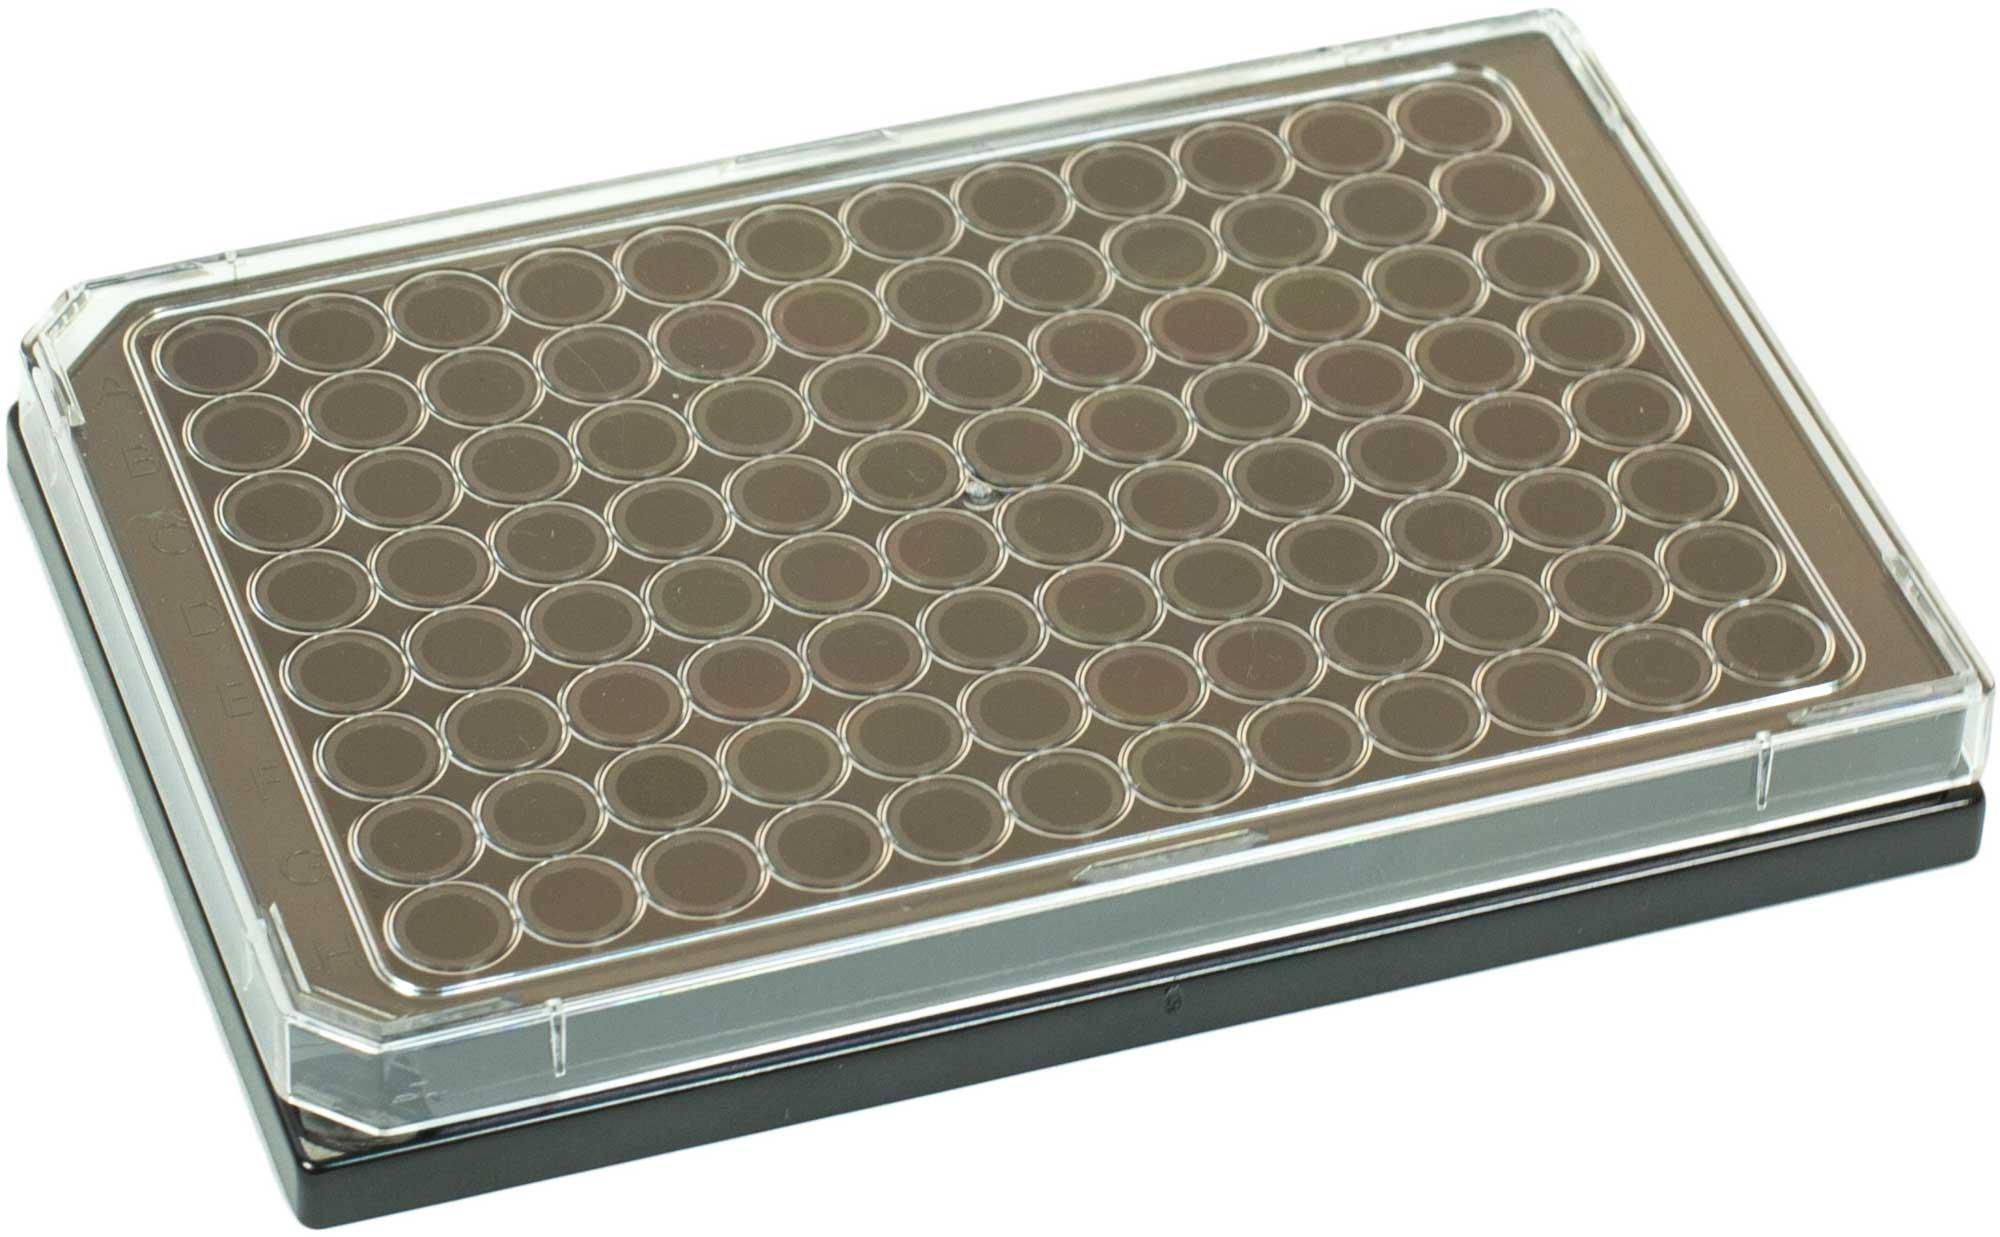 BRANDplates cellGrade Plus Treated Sterile Surface 96-Well Plate - Black, Transparent F-Bottom